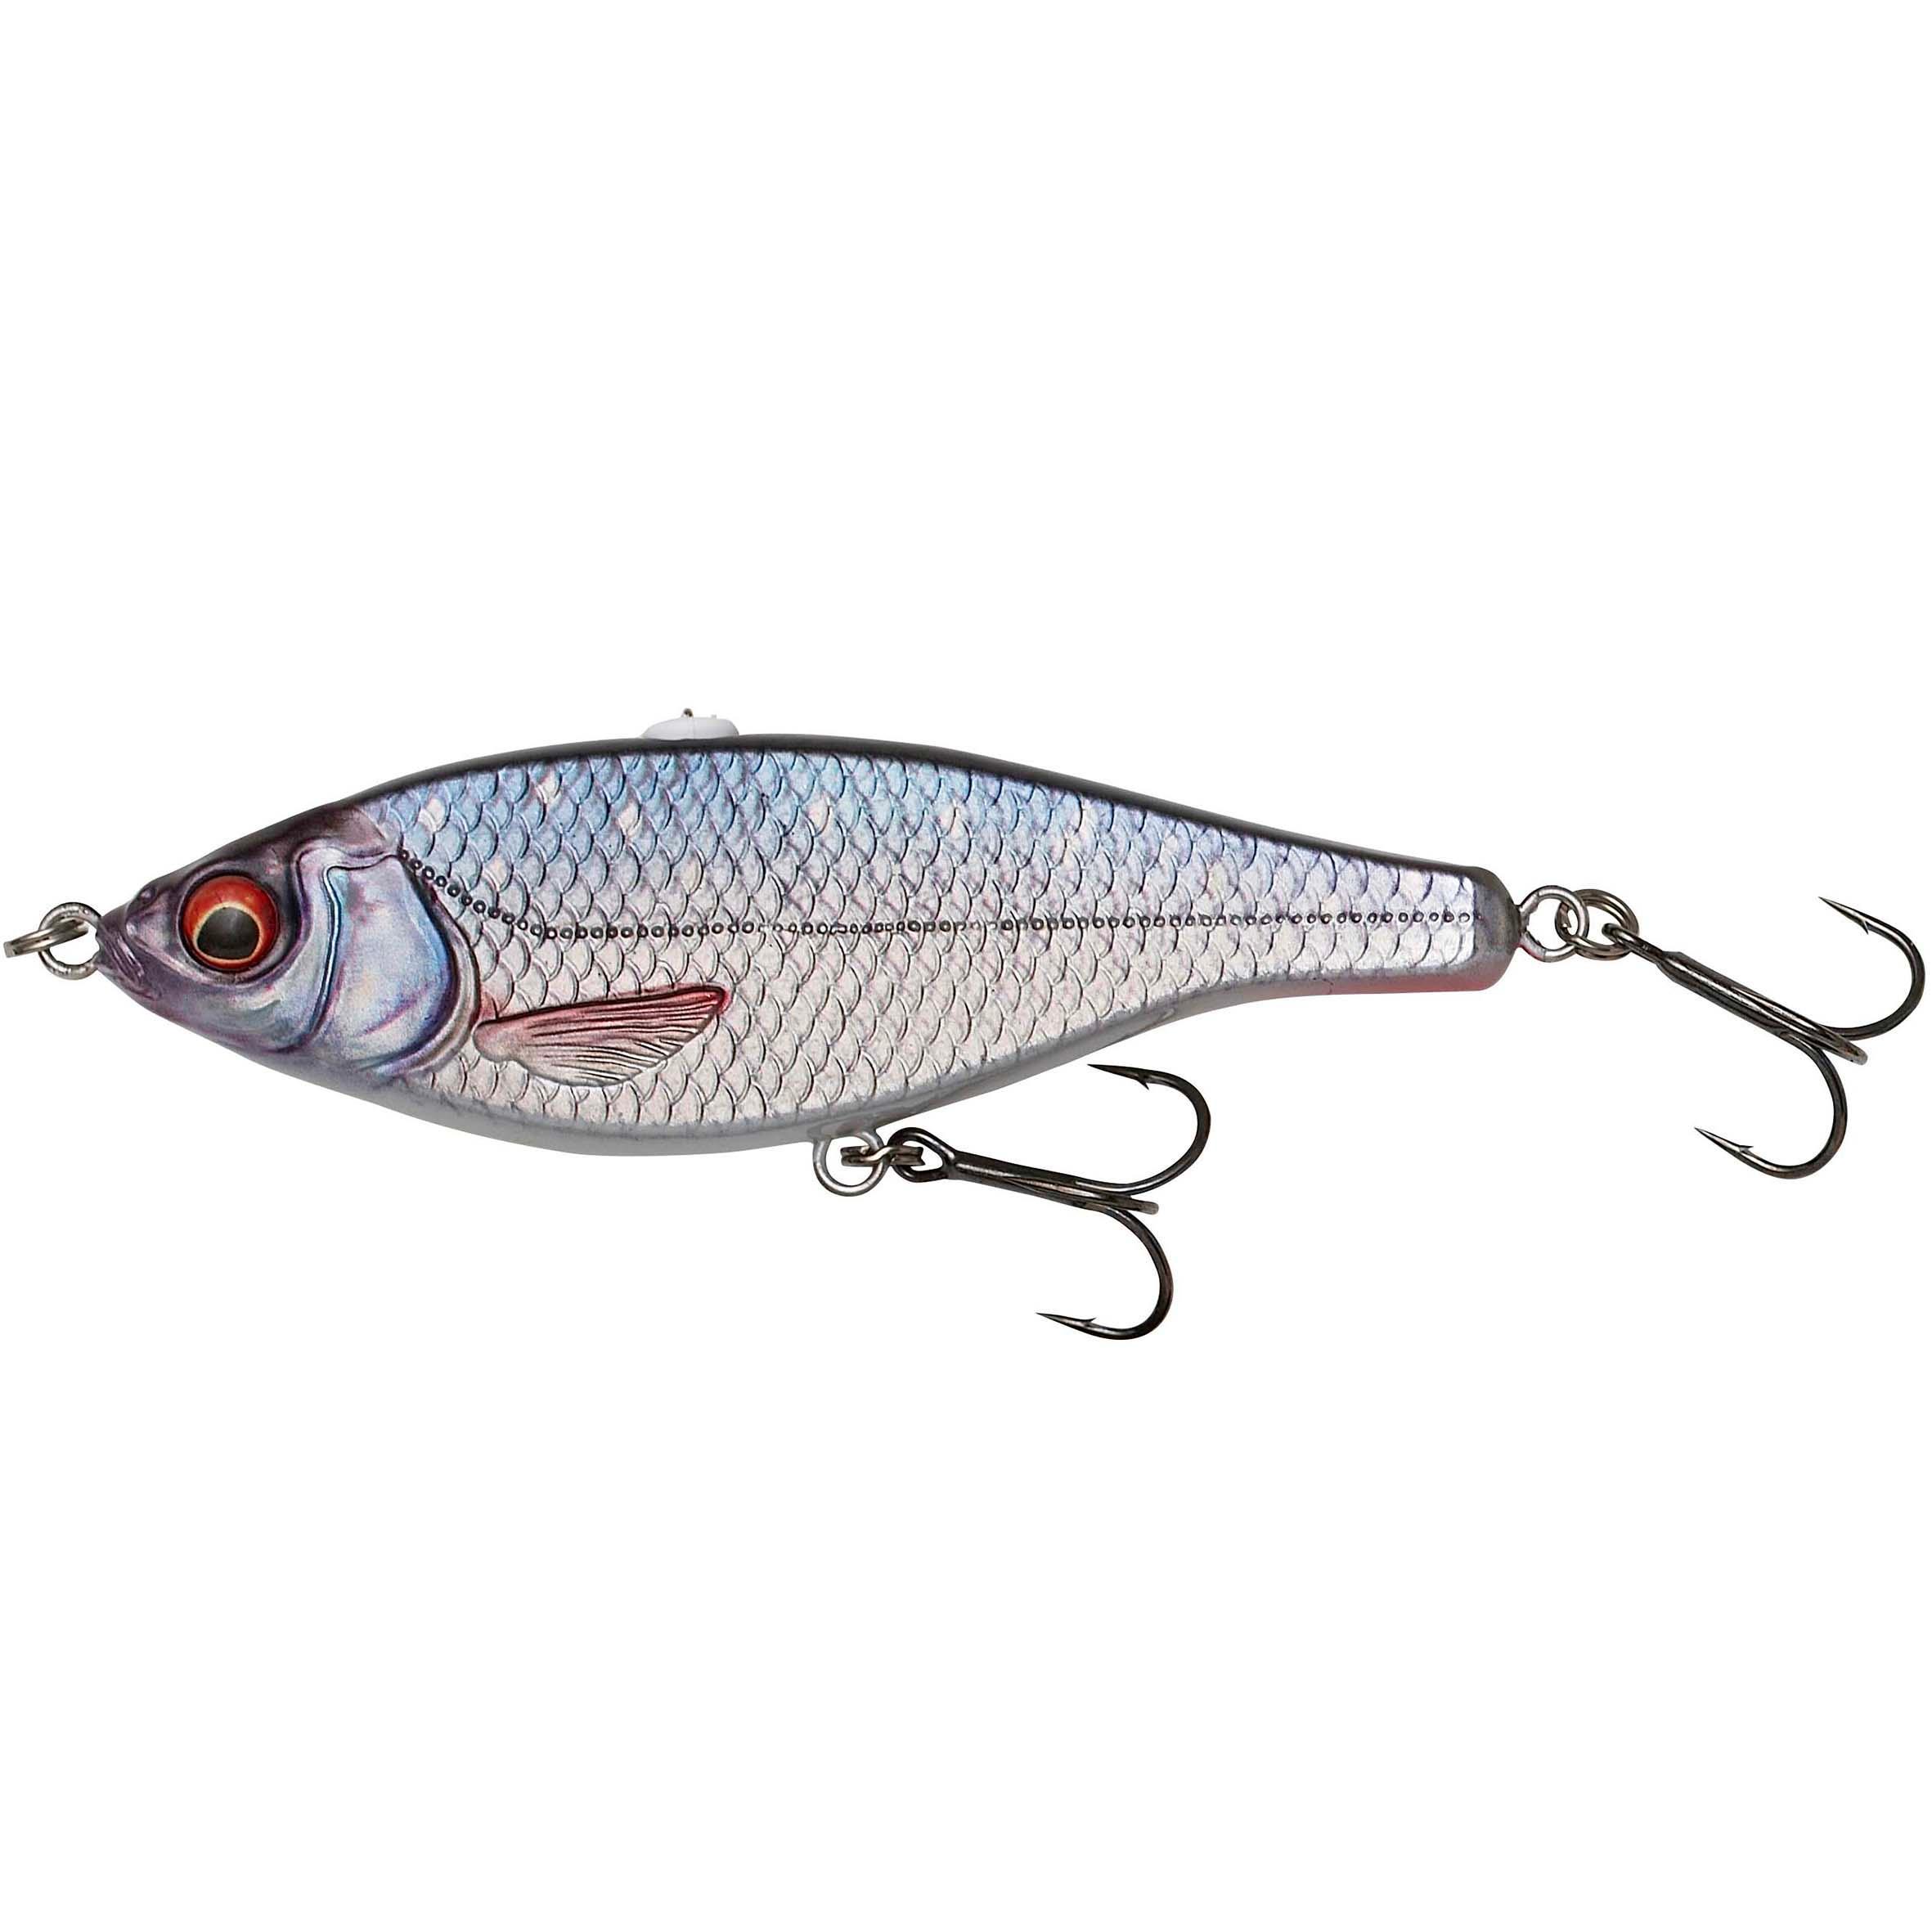 savage gear minnow pesca artificiali luccio 3d roach jerkster - 14.5 roach